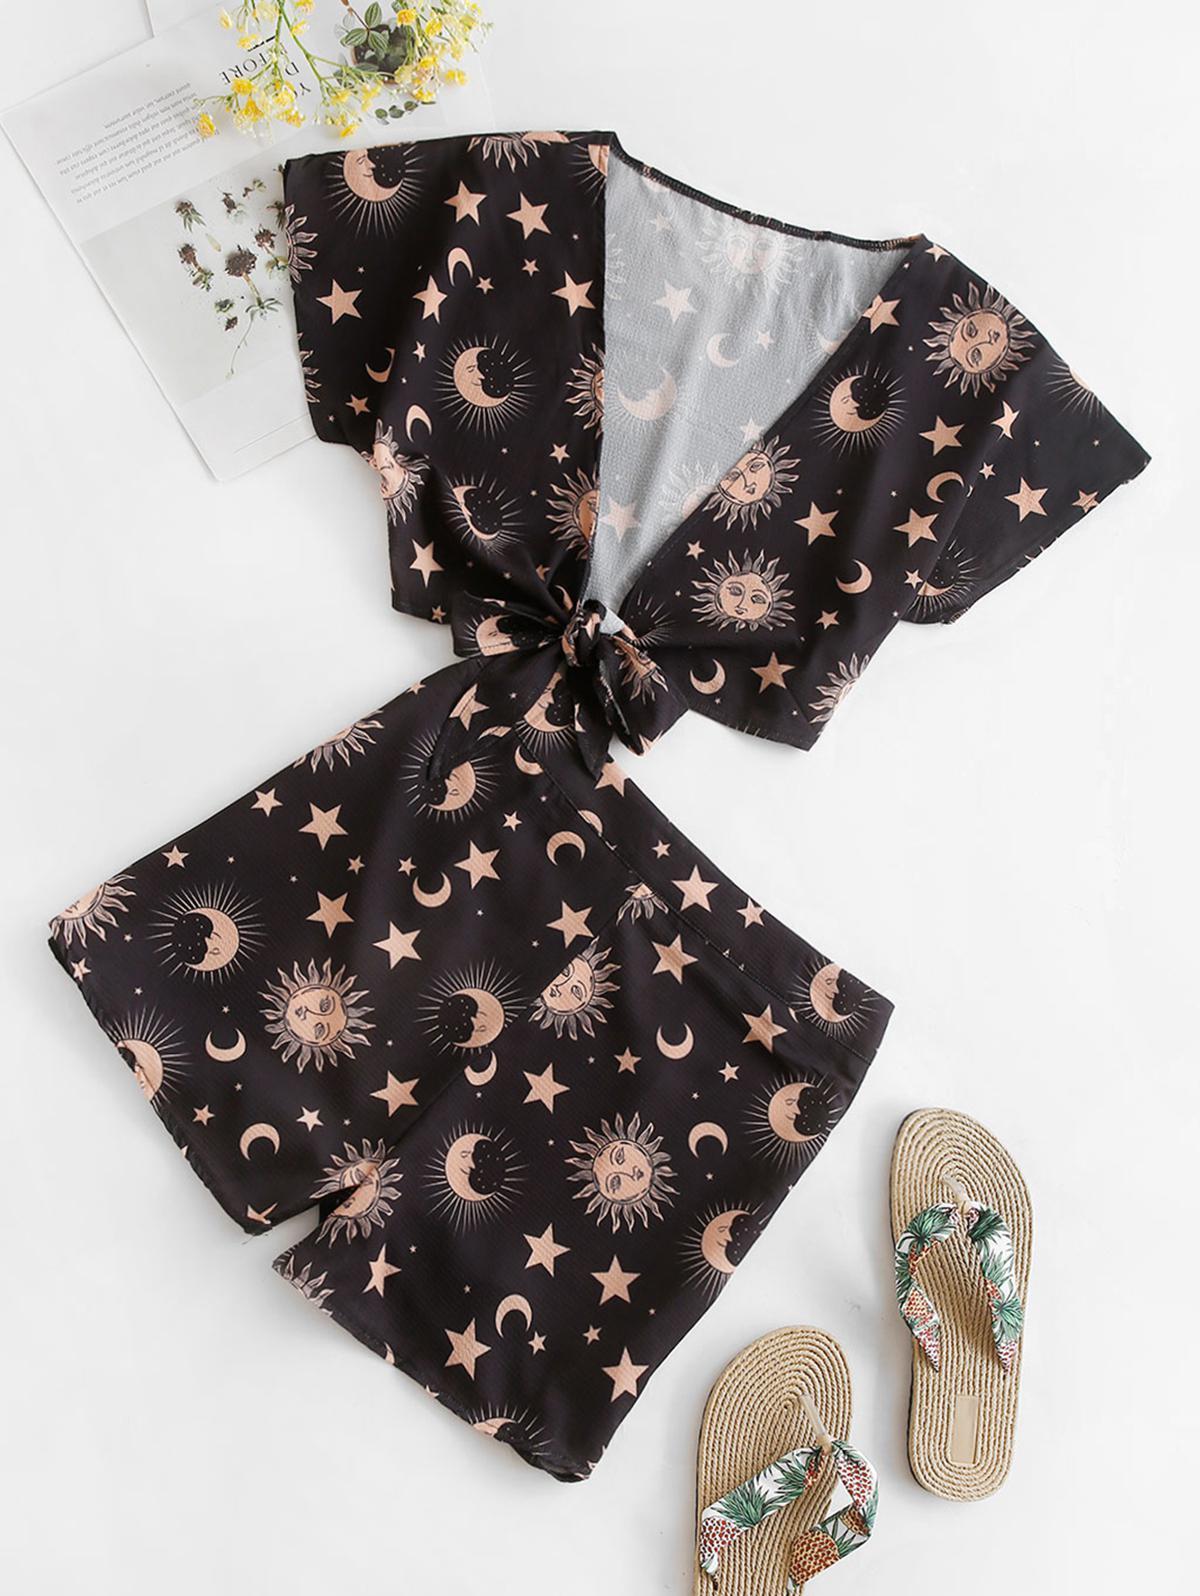 Tie Front Sun Moon Star Print Shorts Set